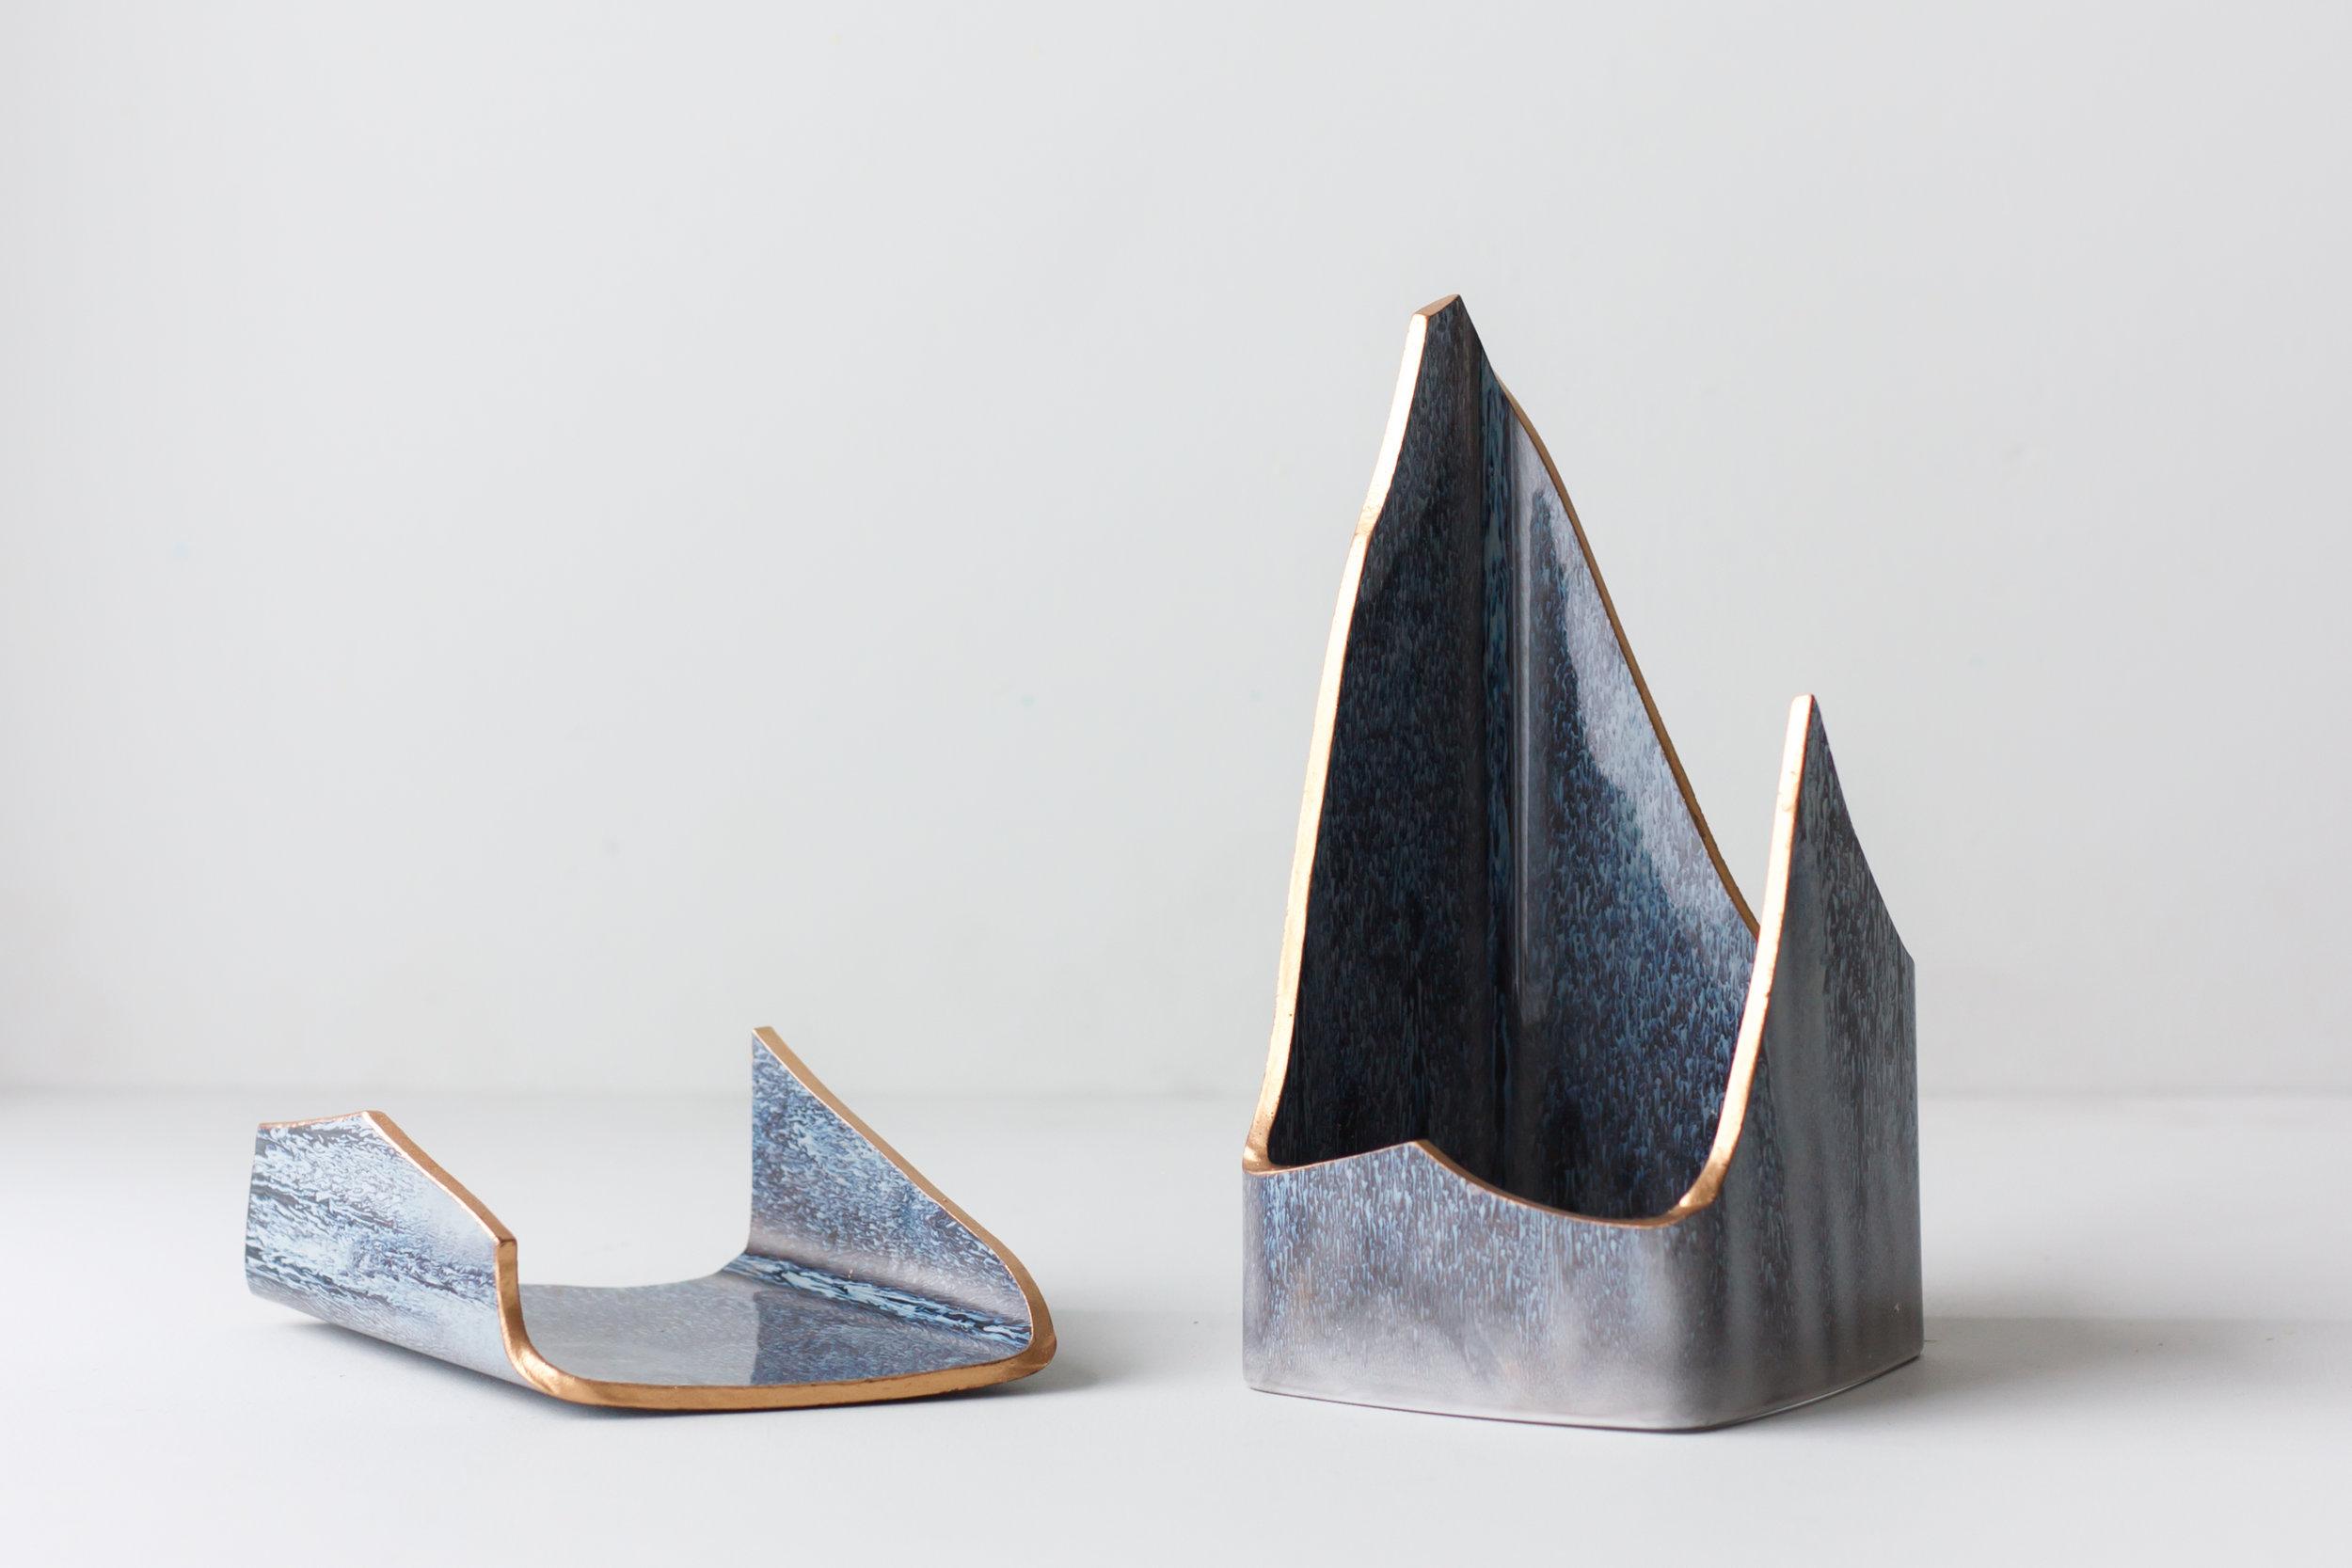 xl-square-kintsugi-vase--reiko-kaneko-ceramics-london-design-festival-2016-ldf16-all-that-is-broken-is-not-lost-studio-glaze-fine-bone-china__29398581261_o.jpg